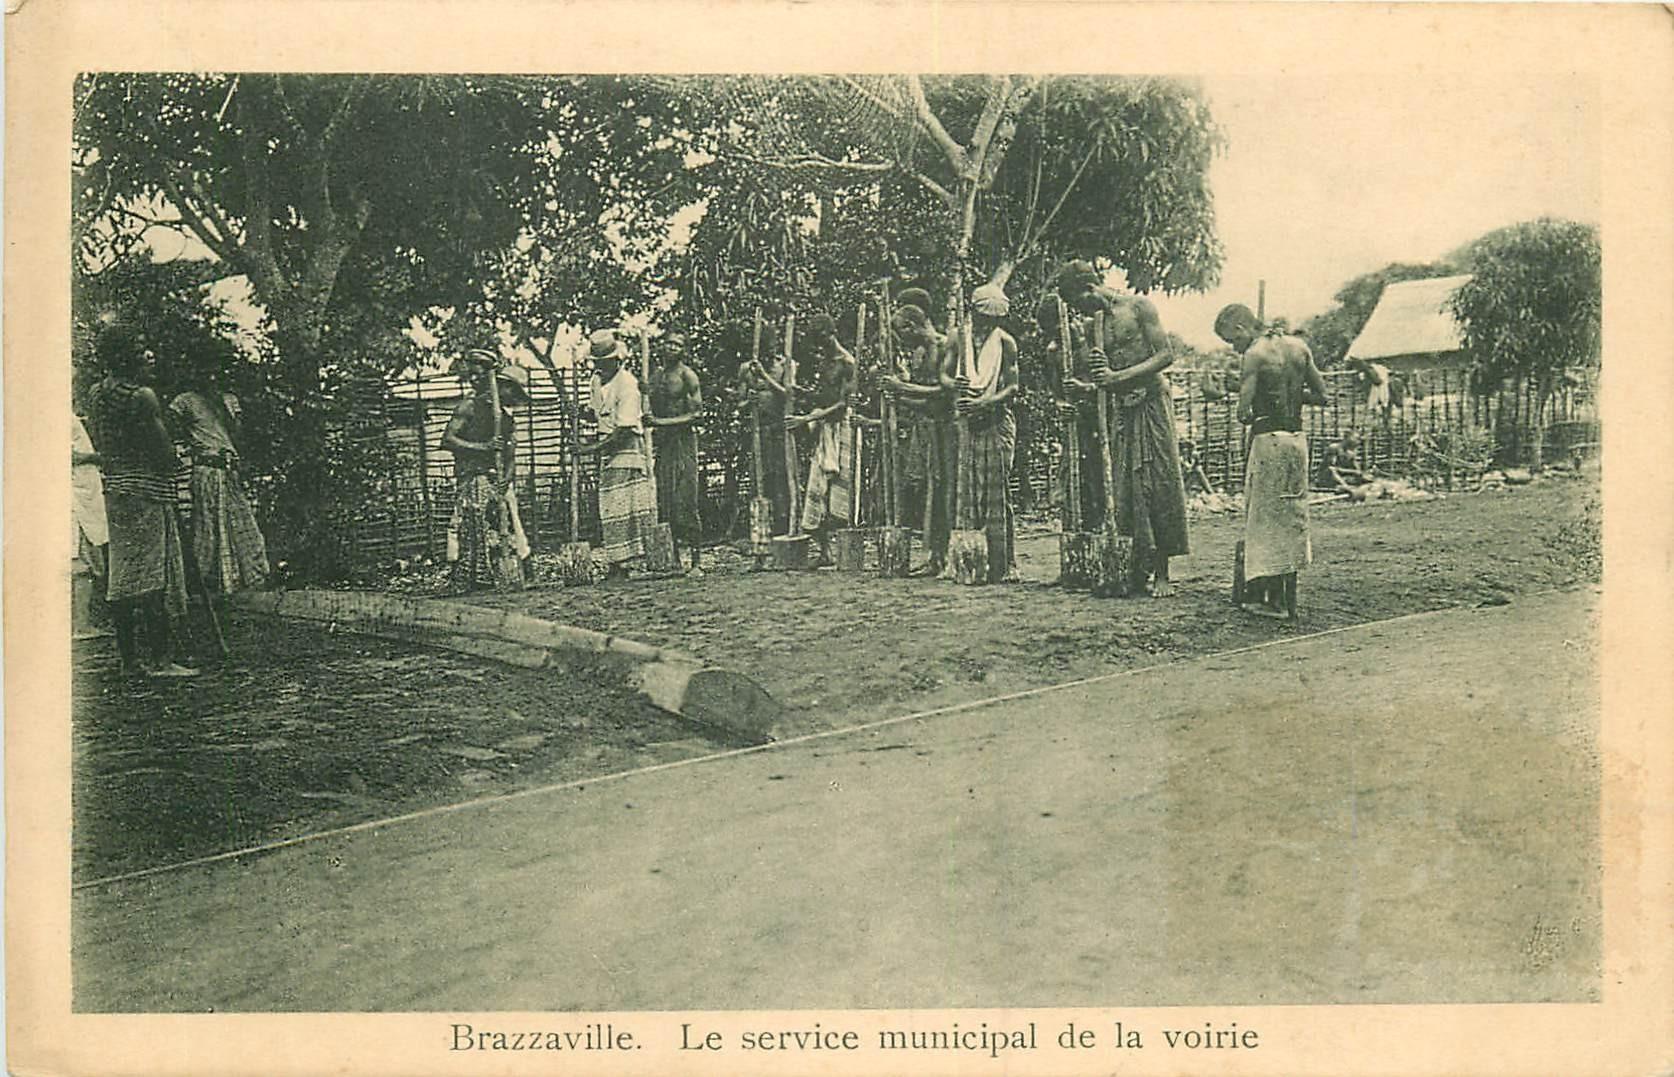 WW BRAZZAVILLE. Le service municipal de la Voirie au Congo 1916